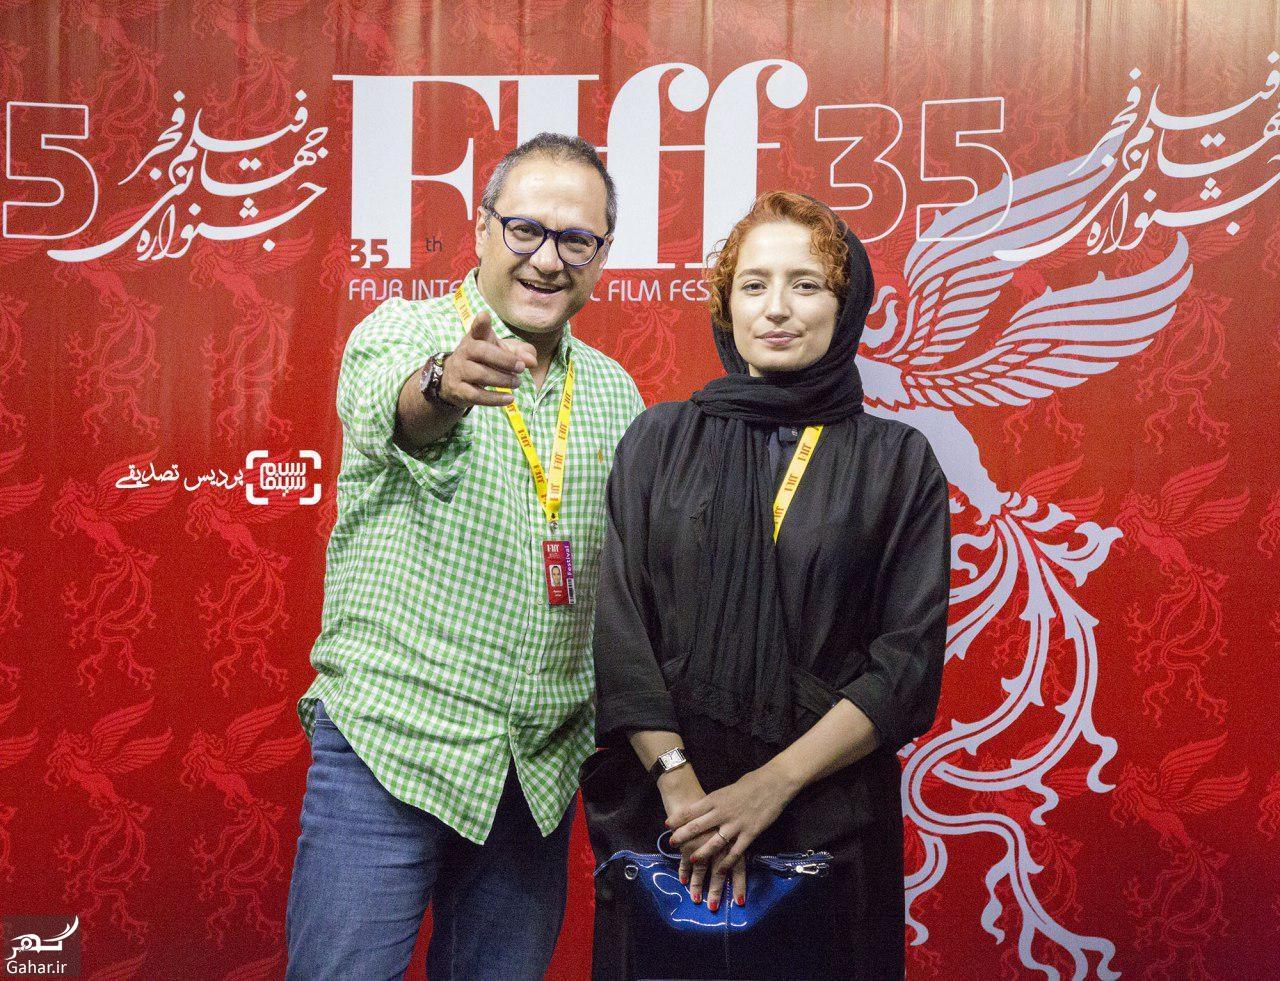 156095 Gahar ir عکس های جدید هنرمندان در سی و پنجمین جشنواره جهانی فیلم فجر